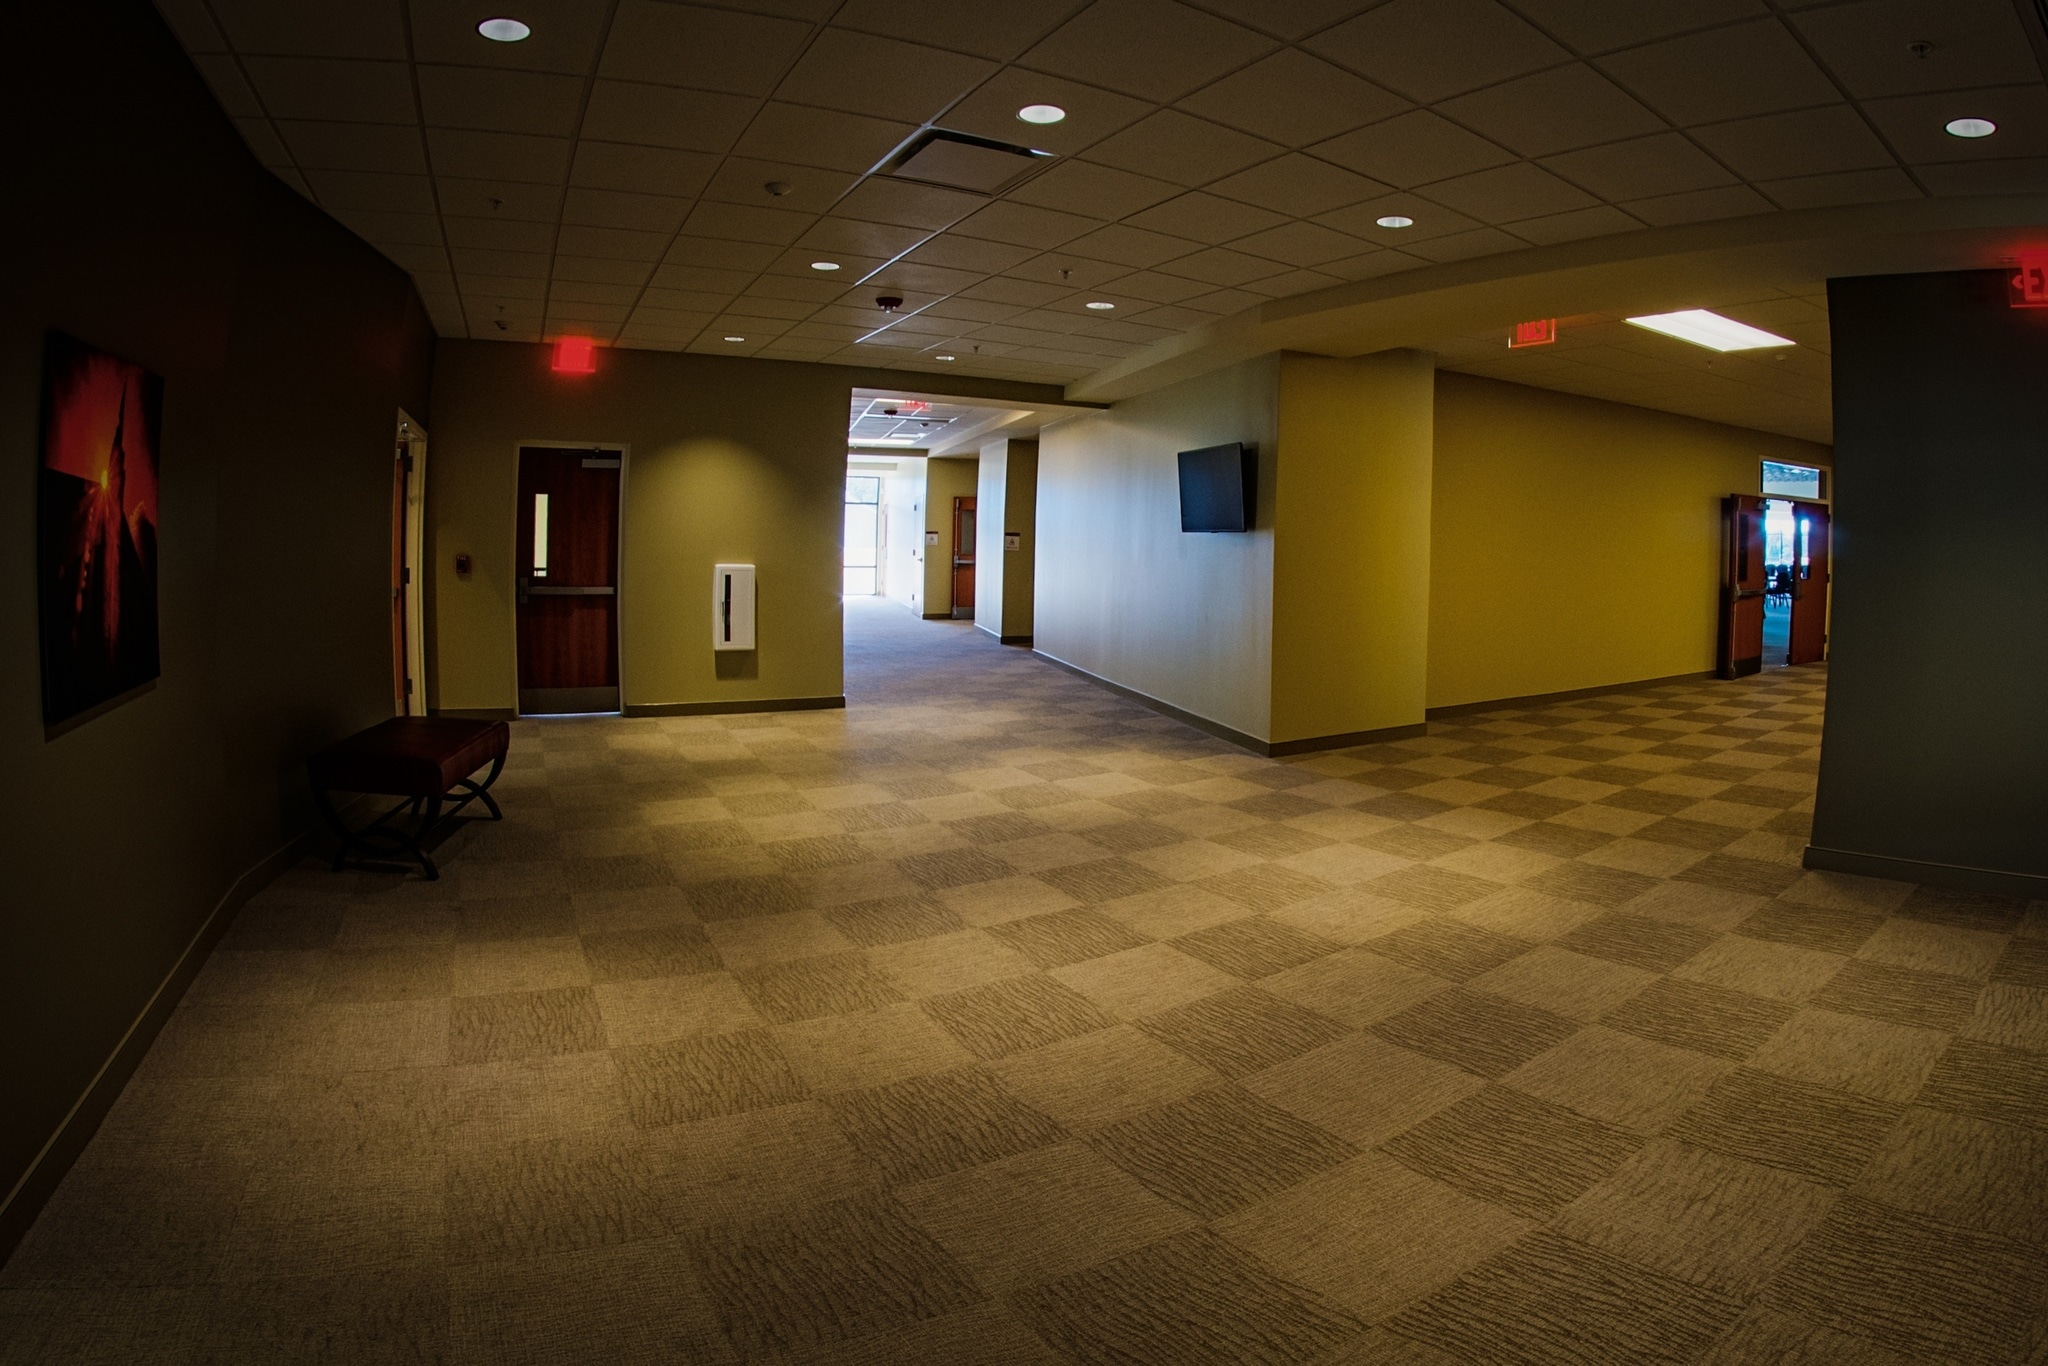 Commercial flooring installer job description home fatare for Flooring jobs